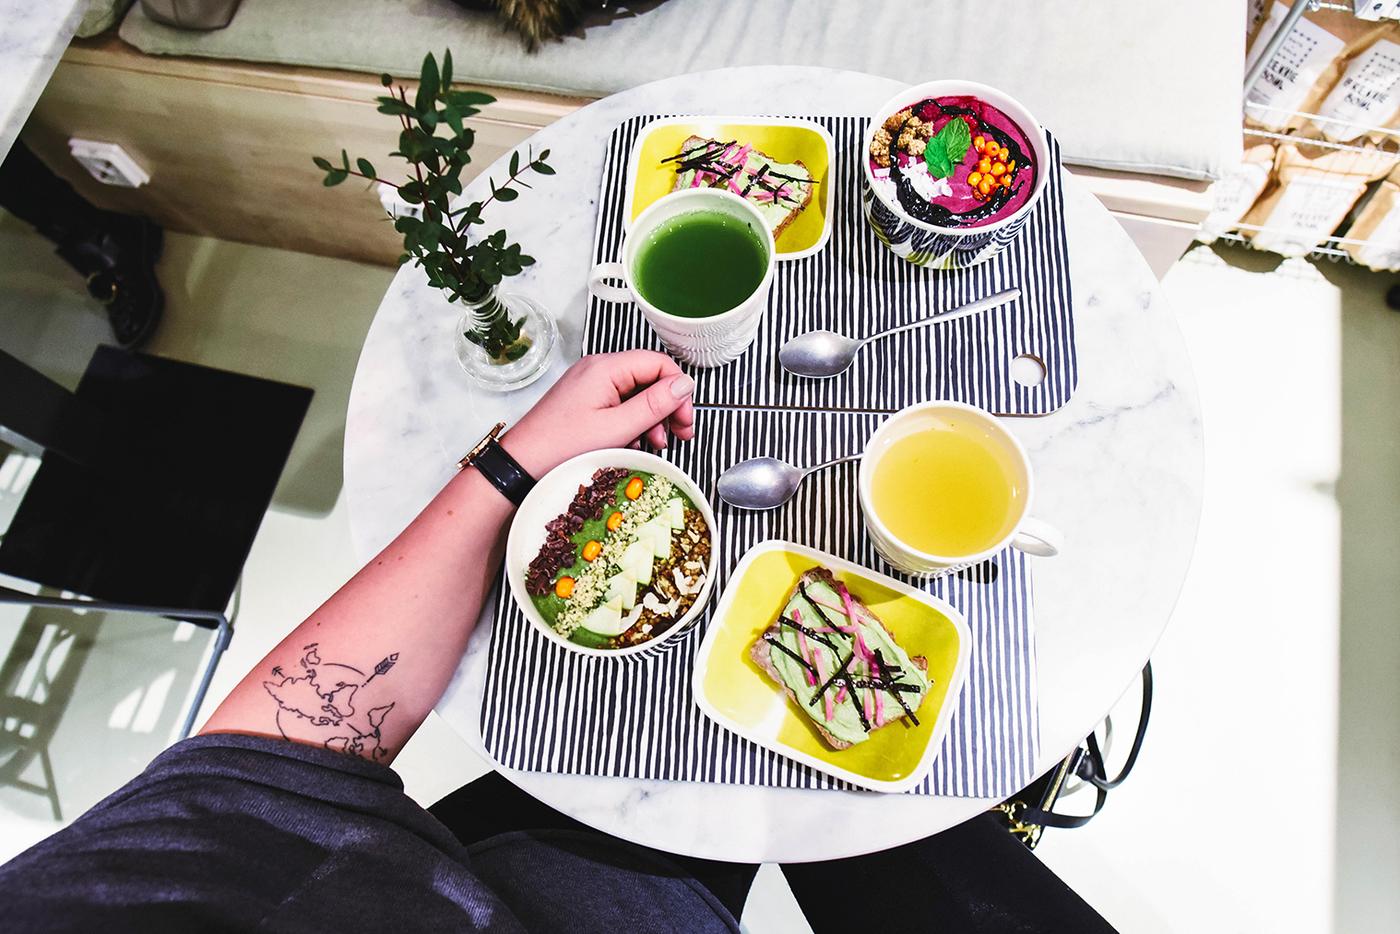 vegaani-vegaaniruokavalio-dateandkale-helsinki-sundayblondie-3.jpg